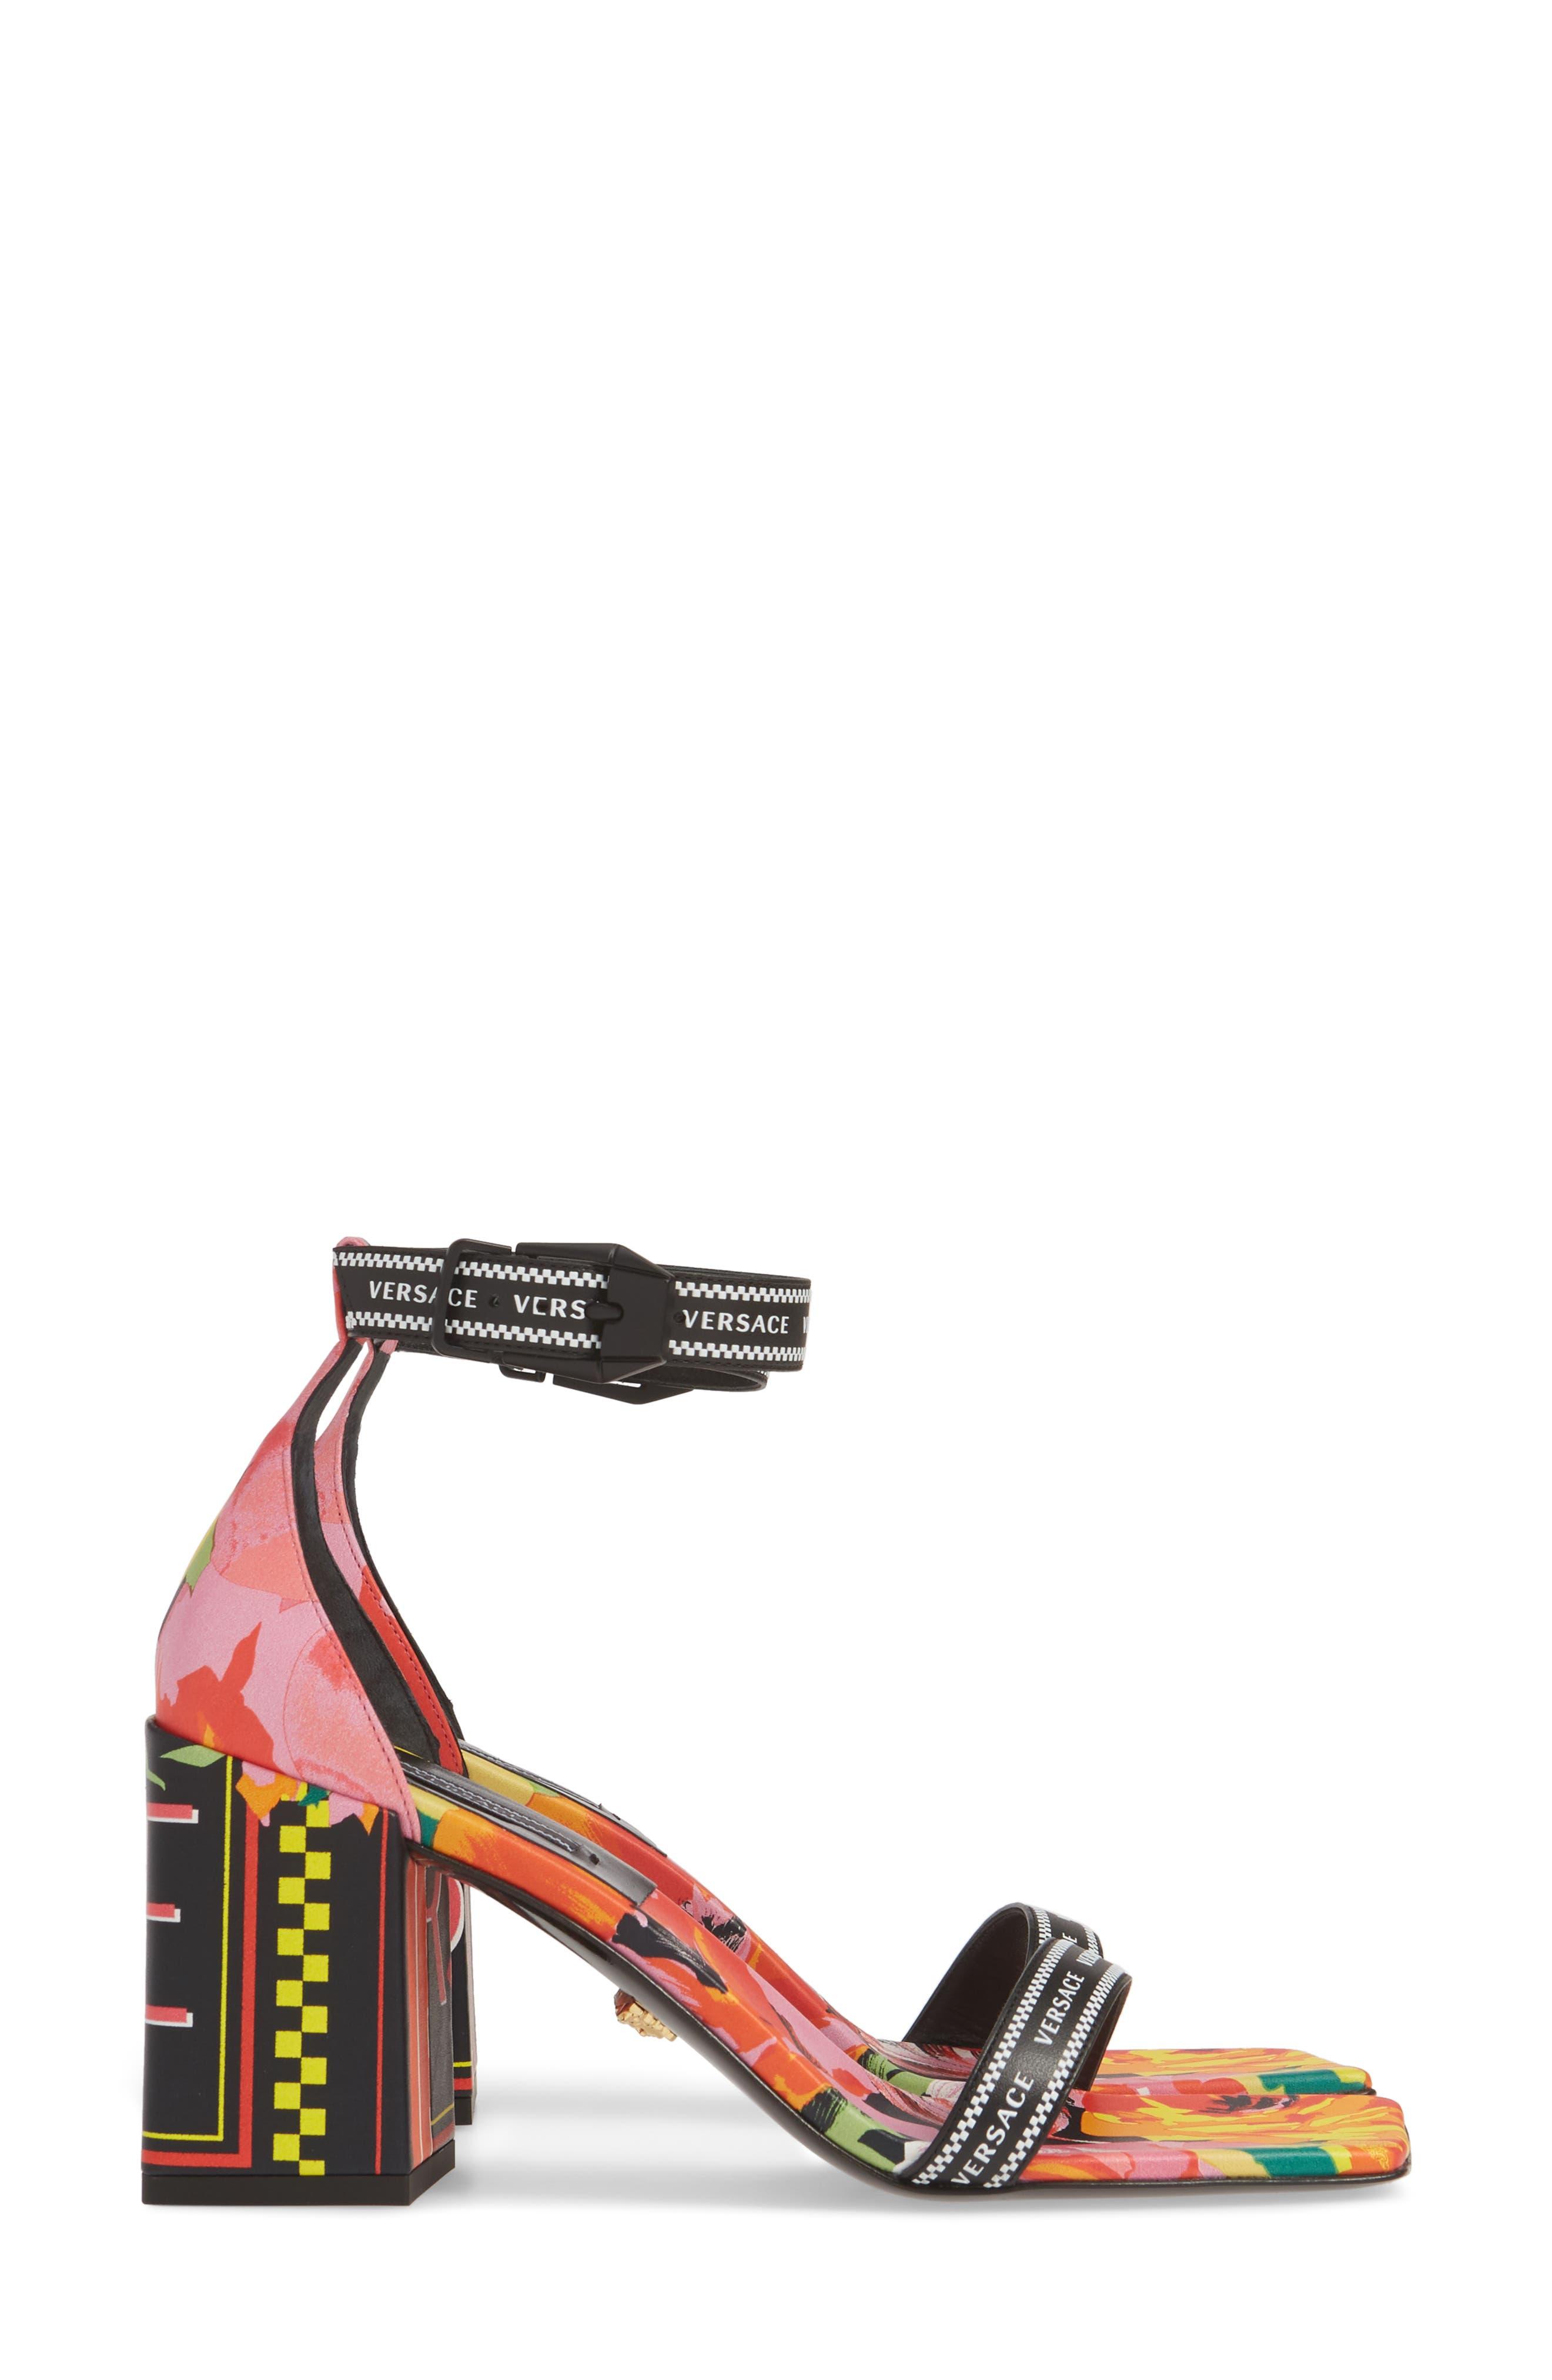 VERSACE FIRST LINE, Floral Logo Ankle Strap Sandal, Alternate thumbnail 4, color, BLACK PRINT